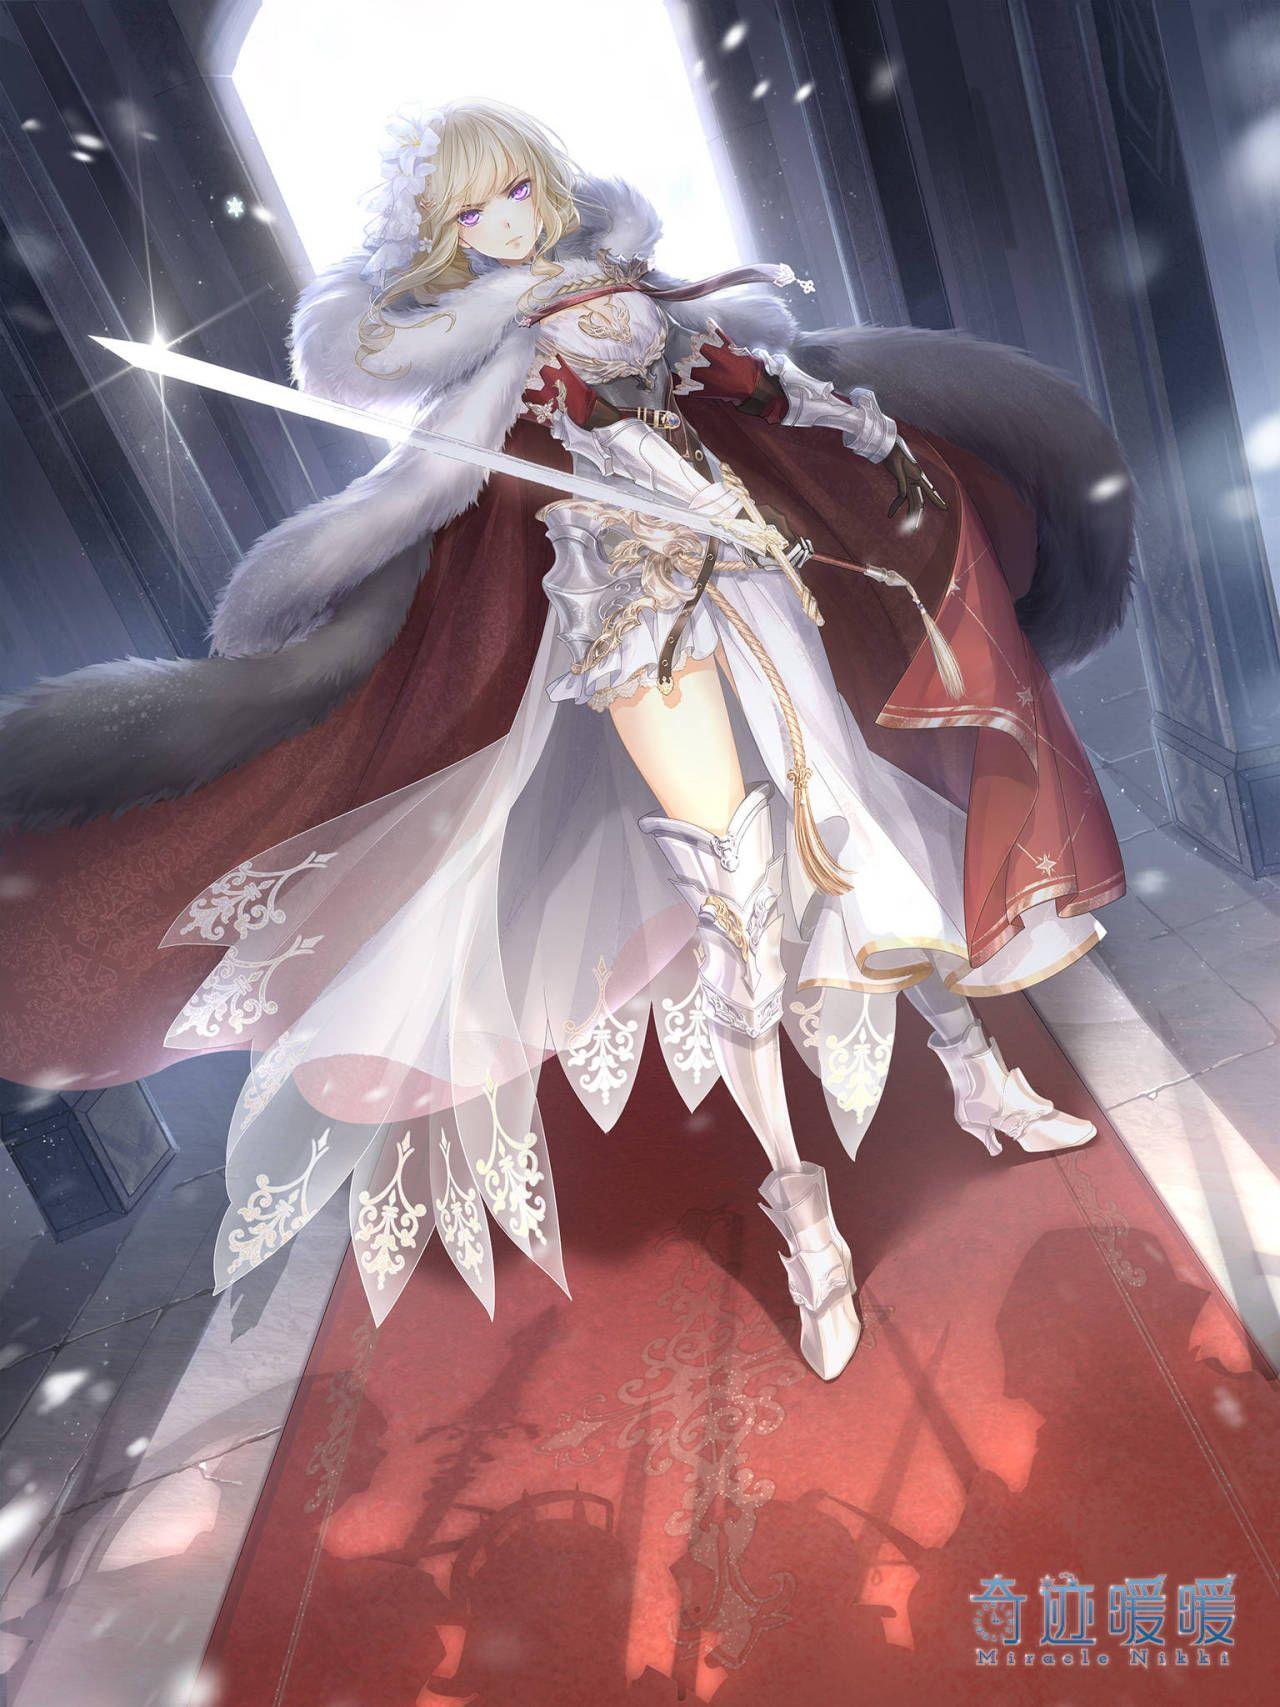 Fanyaneko Anime Angel Girl Anime Princess Anime Warrior